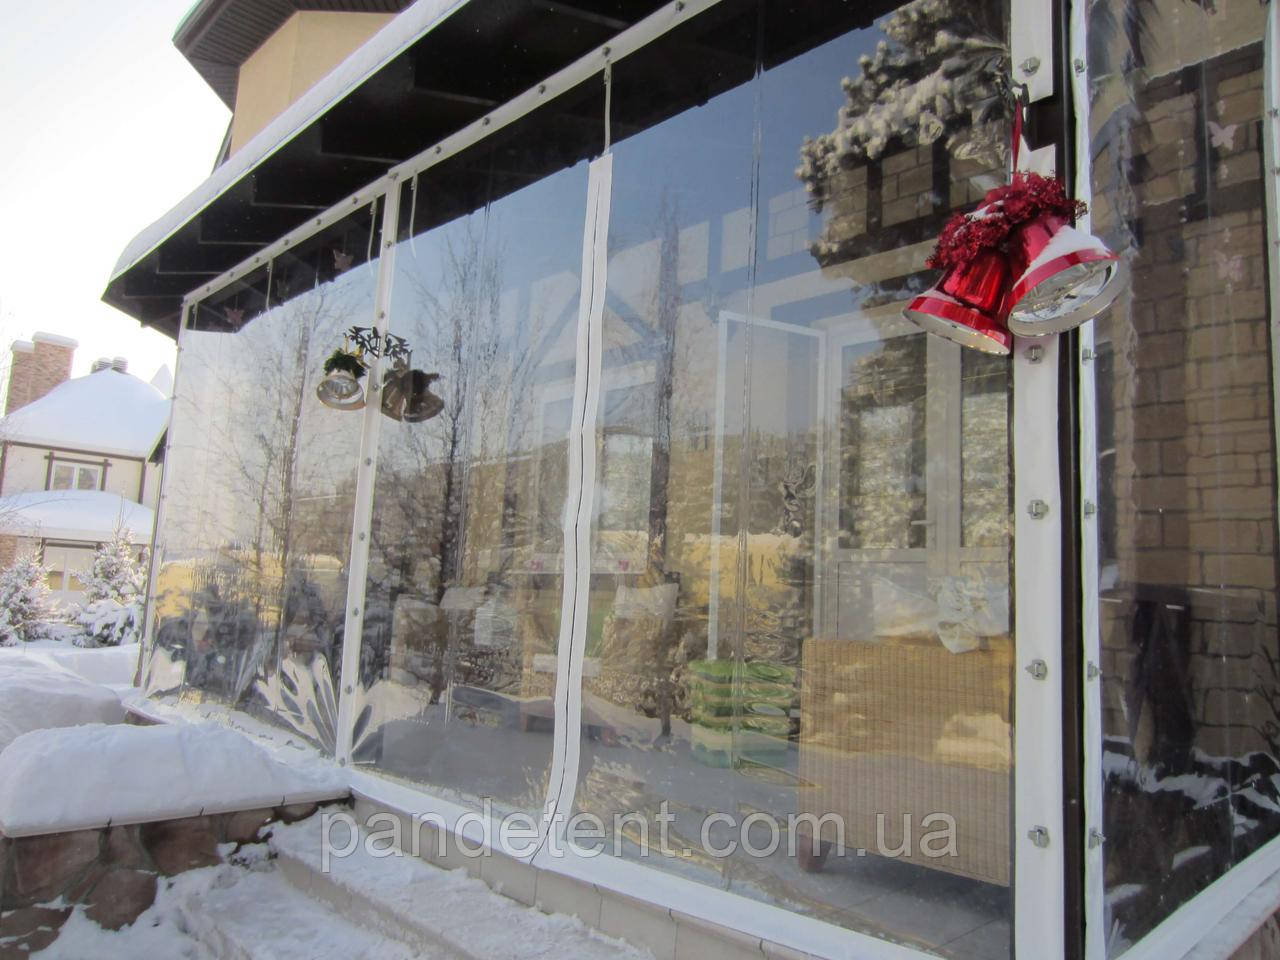 Мягкие окна для беседок - Защита от ветра, дождя и снега